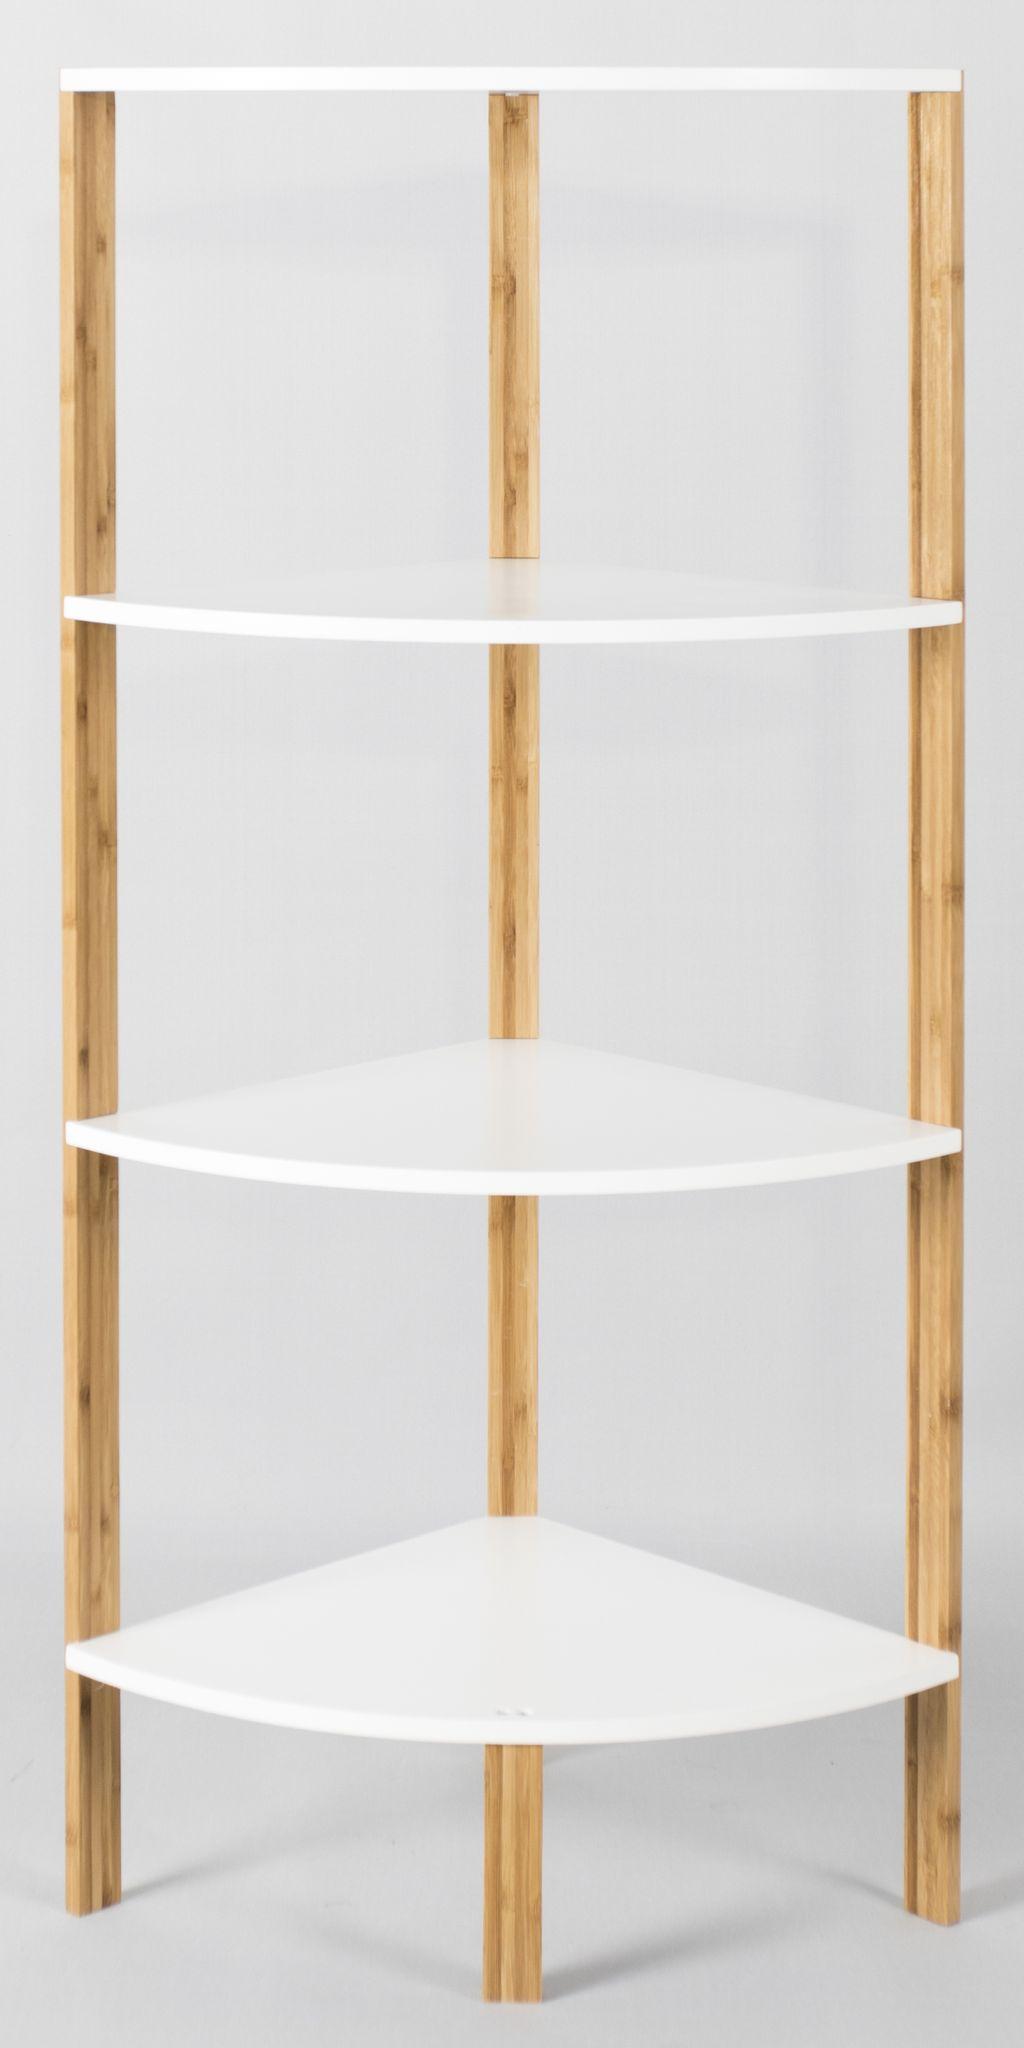 armoire d 39 angle bambou tag re de salle bain cuisine. Black Bedroom Furniture Sets. Home Design Ideas